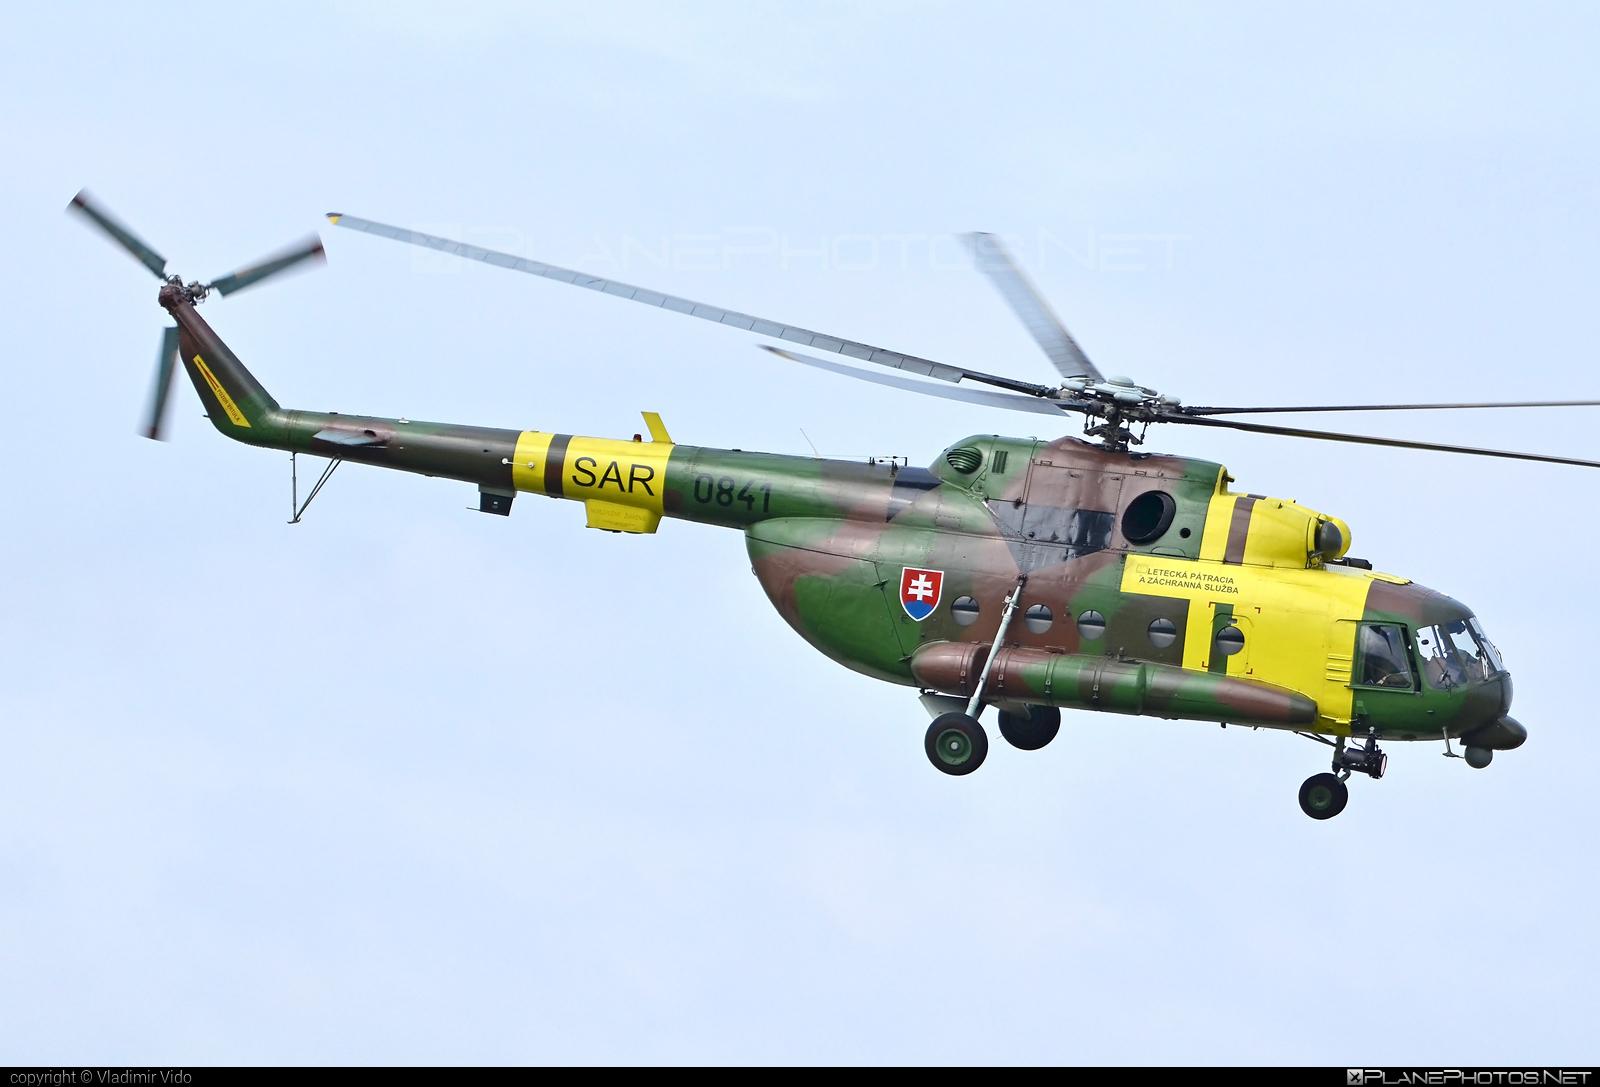 Mil Mi-17LPZS - 0841 operated by Vzdušné sily OS SR (Slovak Air Force) #mi17 #mi17lpzs #mil #milhelicopters #milmi17 #milmi17lpzs #slovakairforce #vzdusnesilyossr